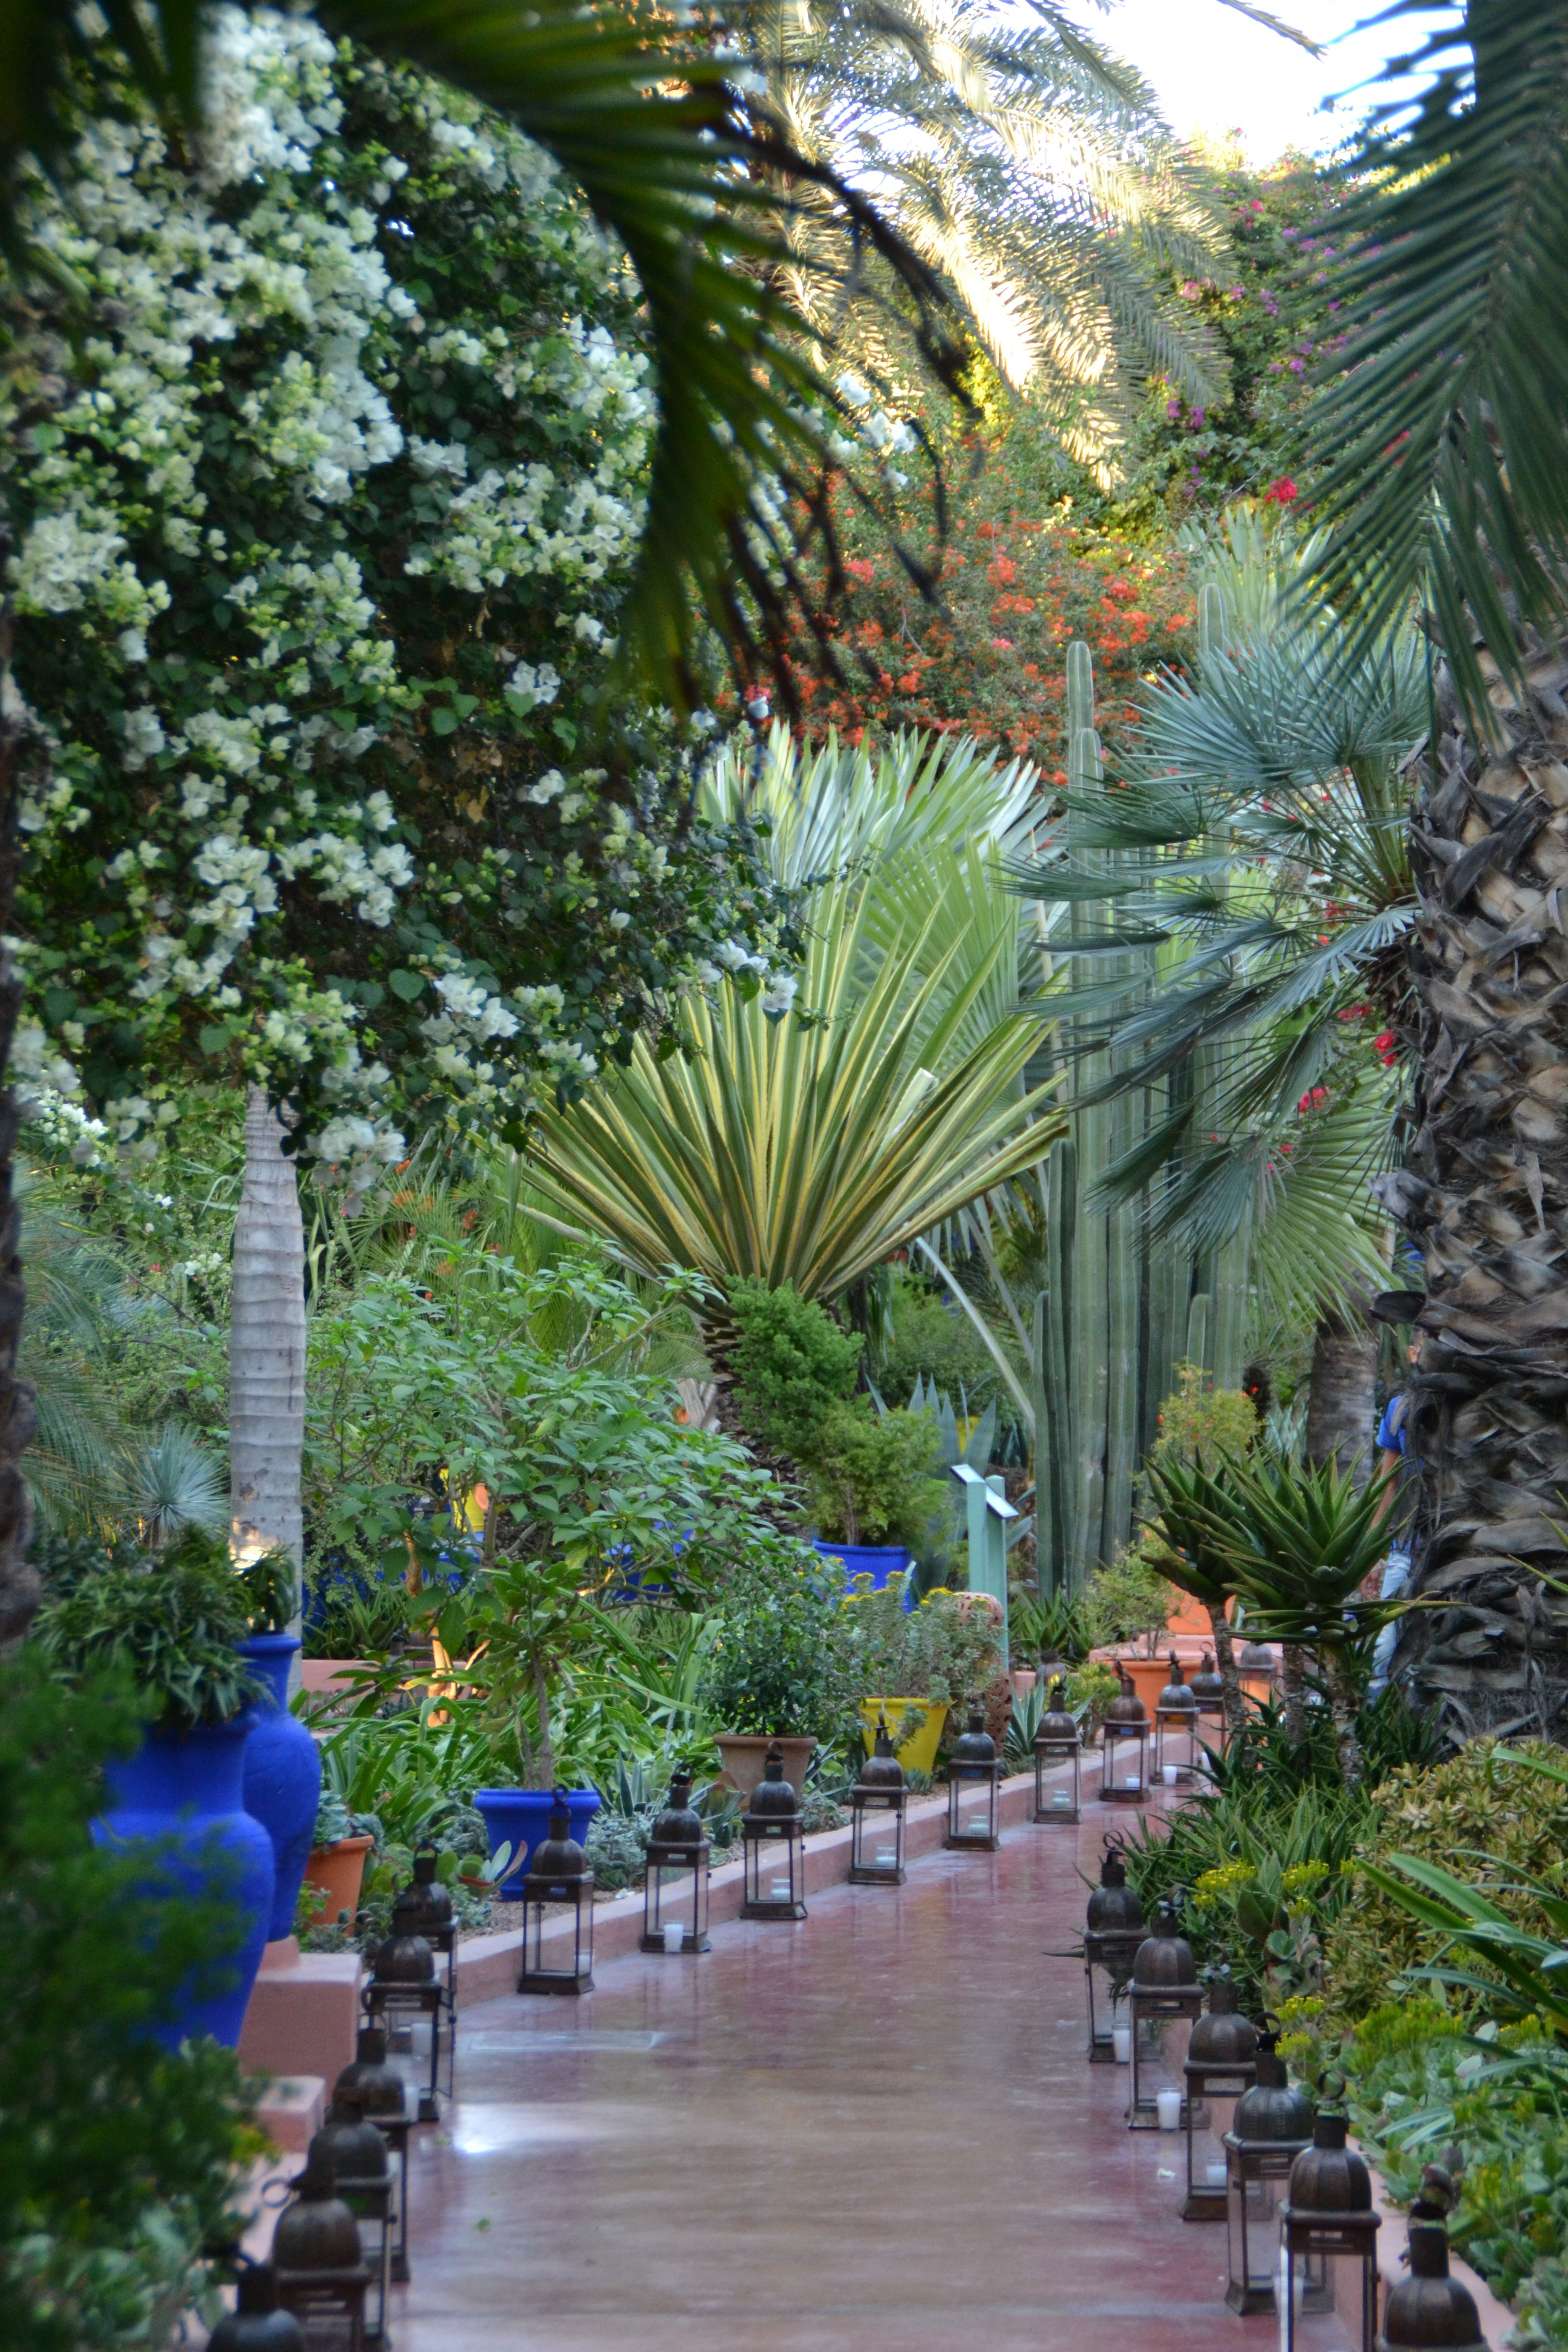 les jardins de majorelles marrakech pinterest jardin majorelle jardins et maroc. Black Bedroom Furniture Sets. Home Design Ideas